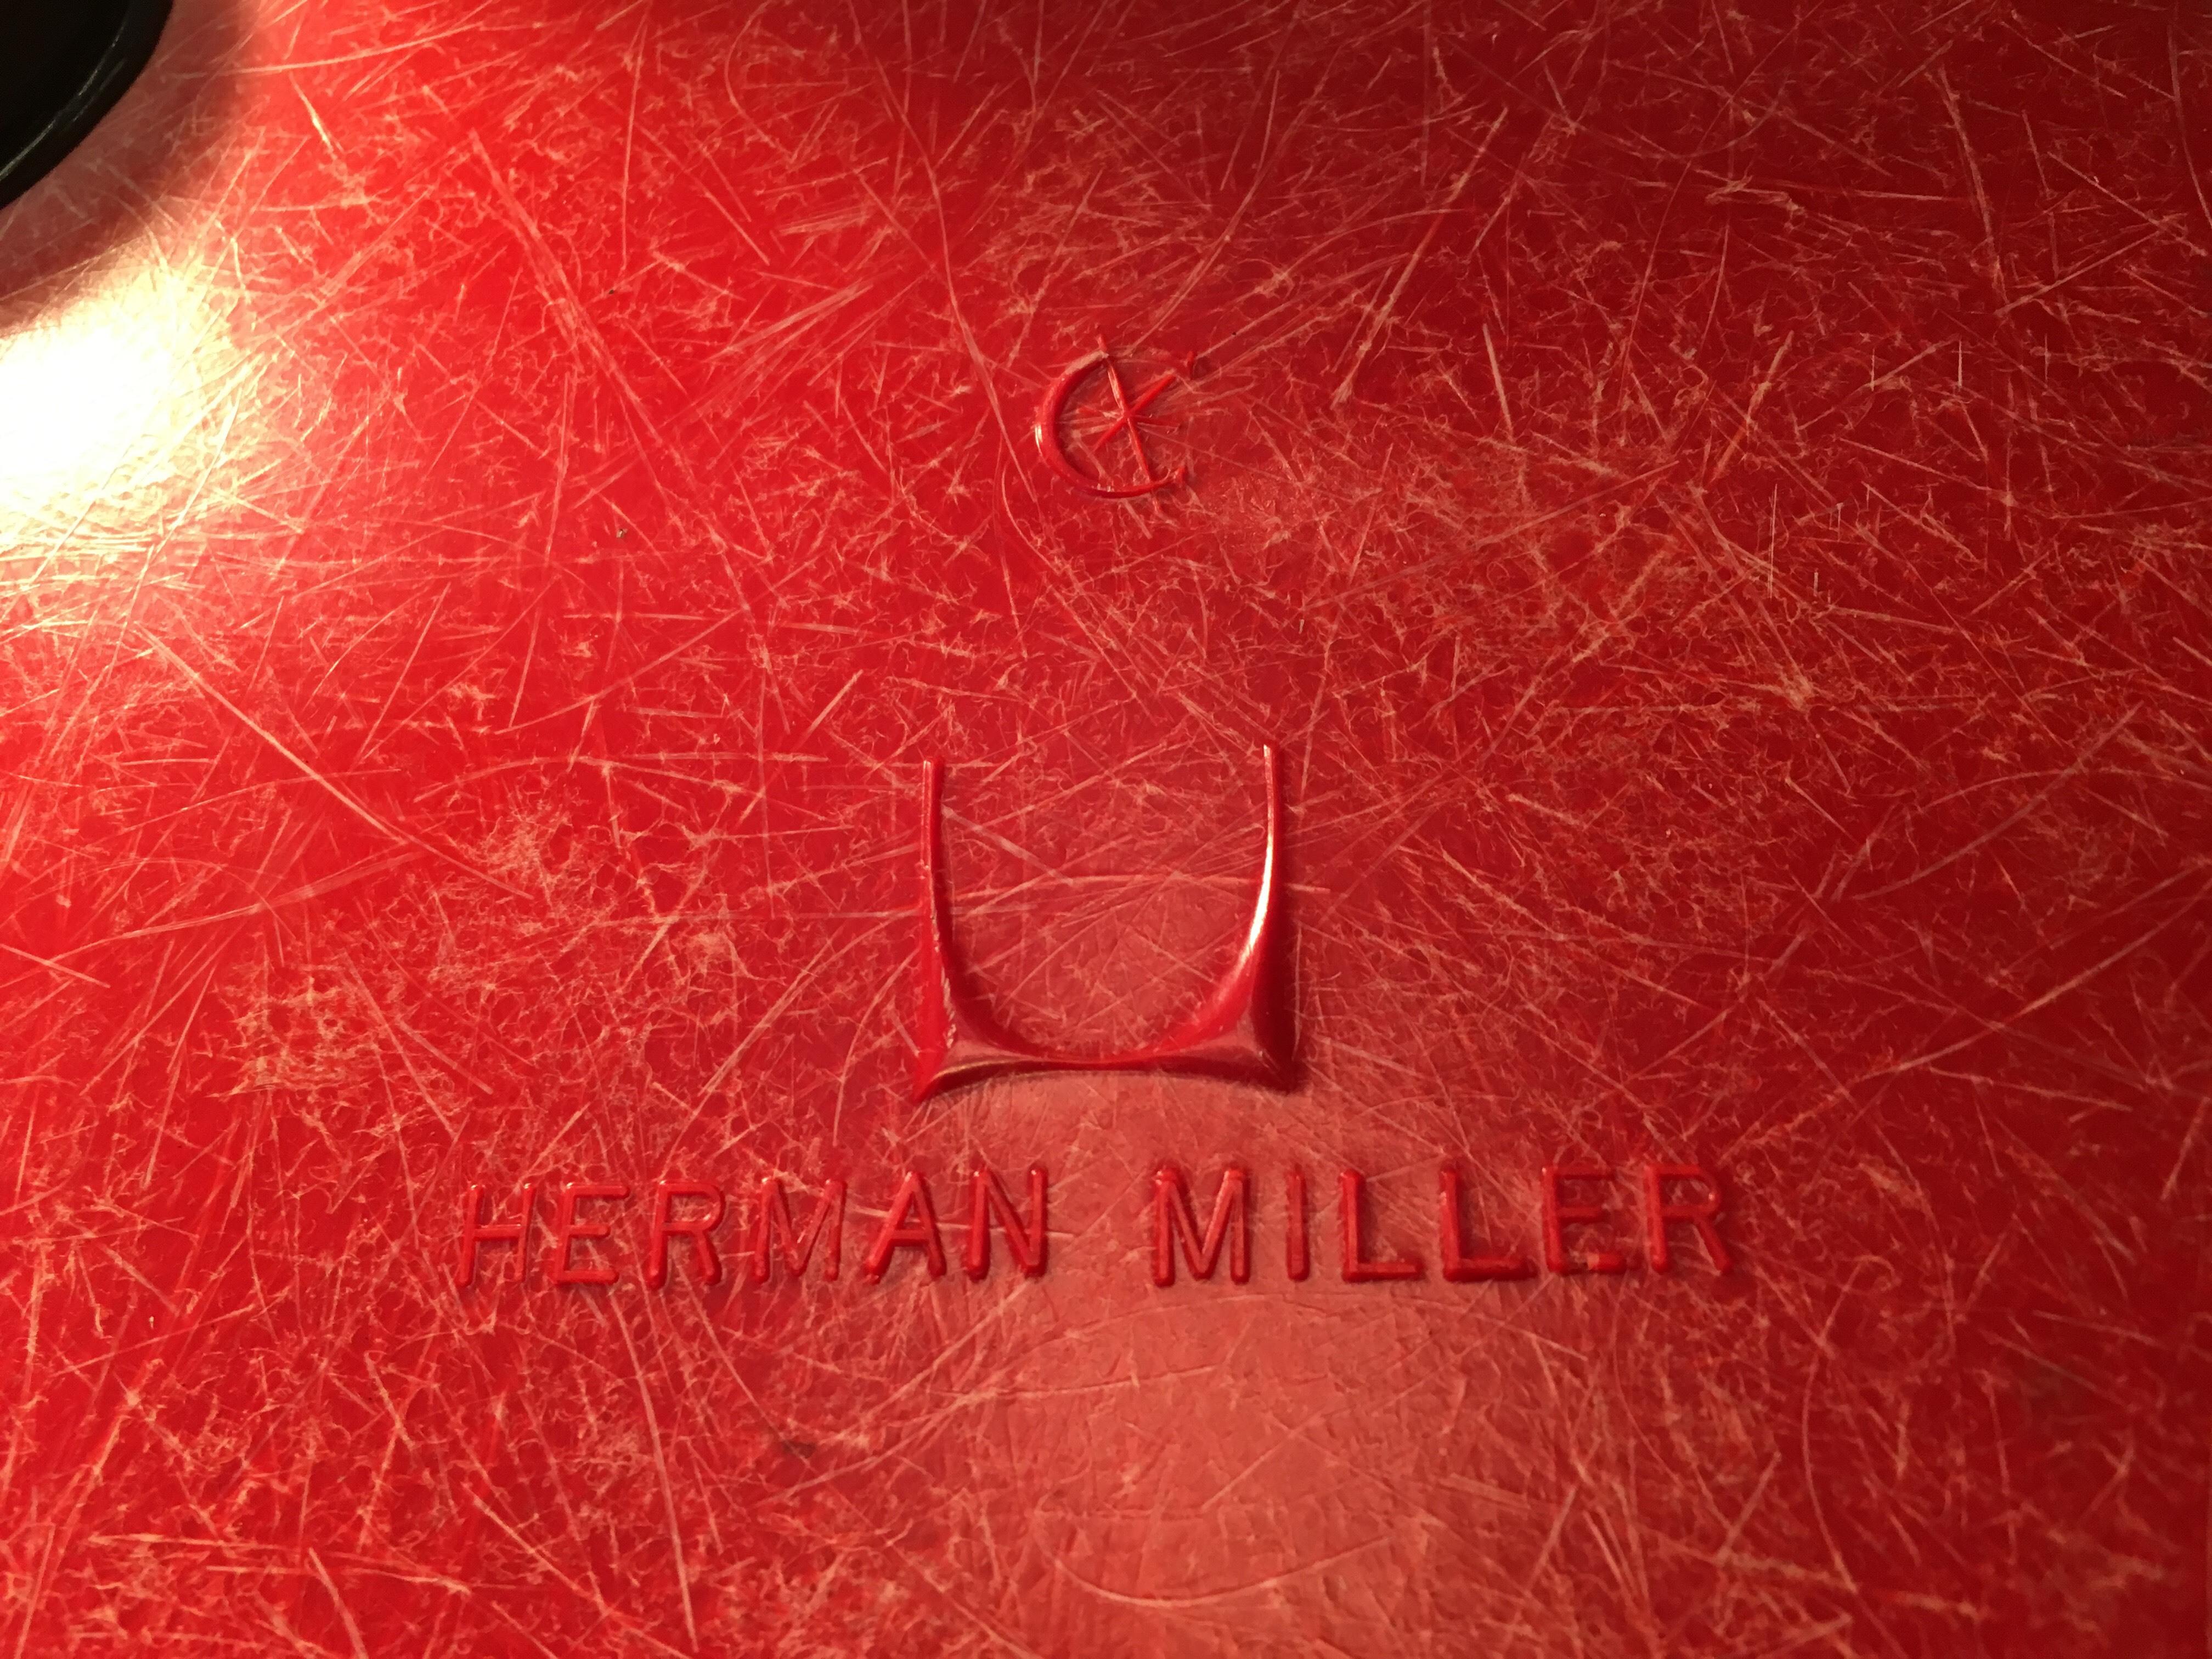 herman miller ハーマンミラー ヴィンテージサイドシェルチェア